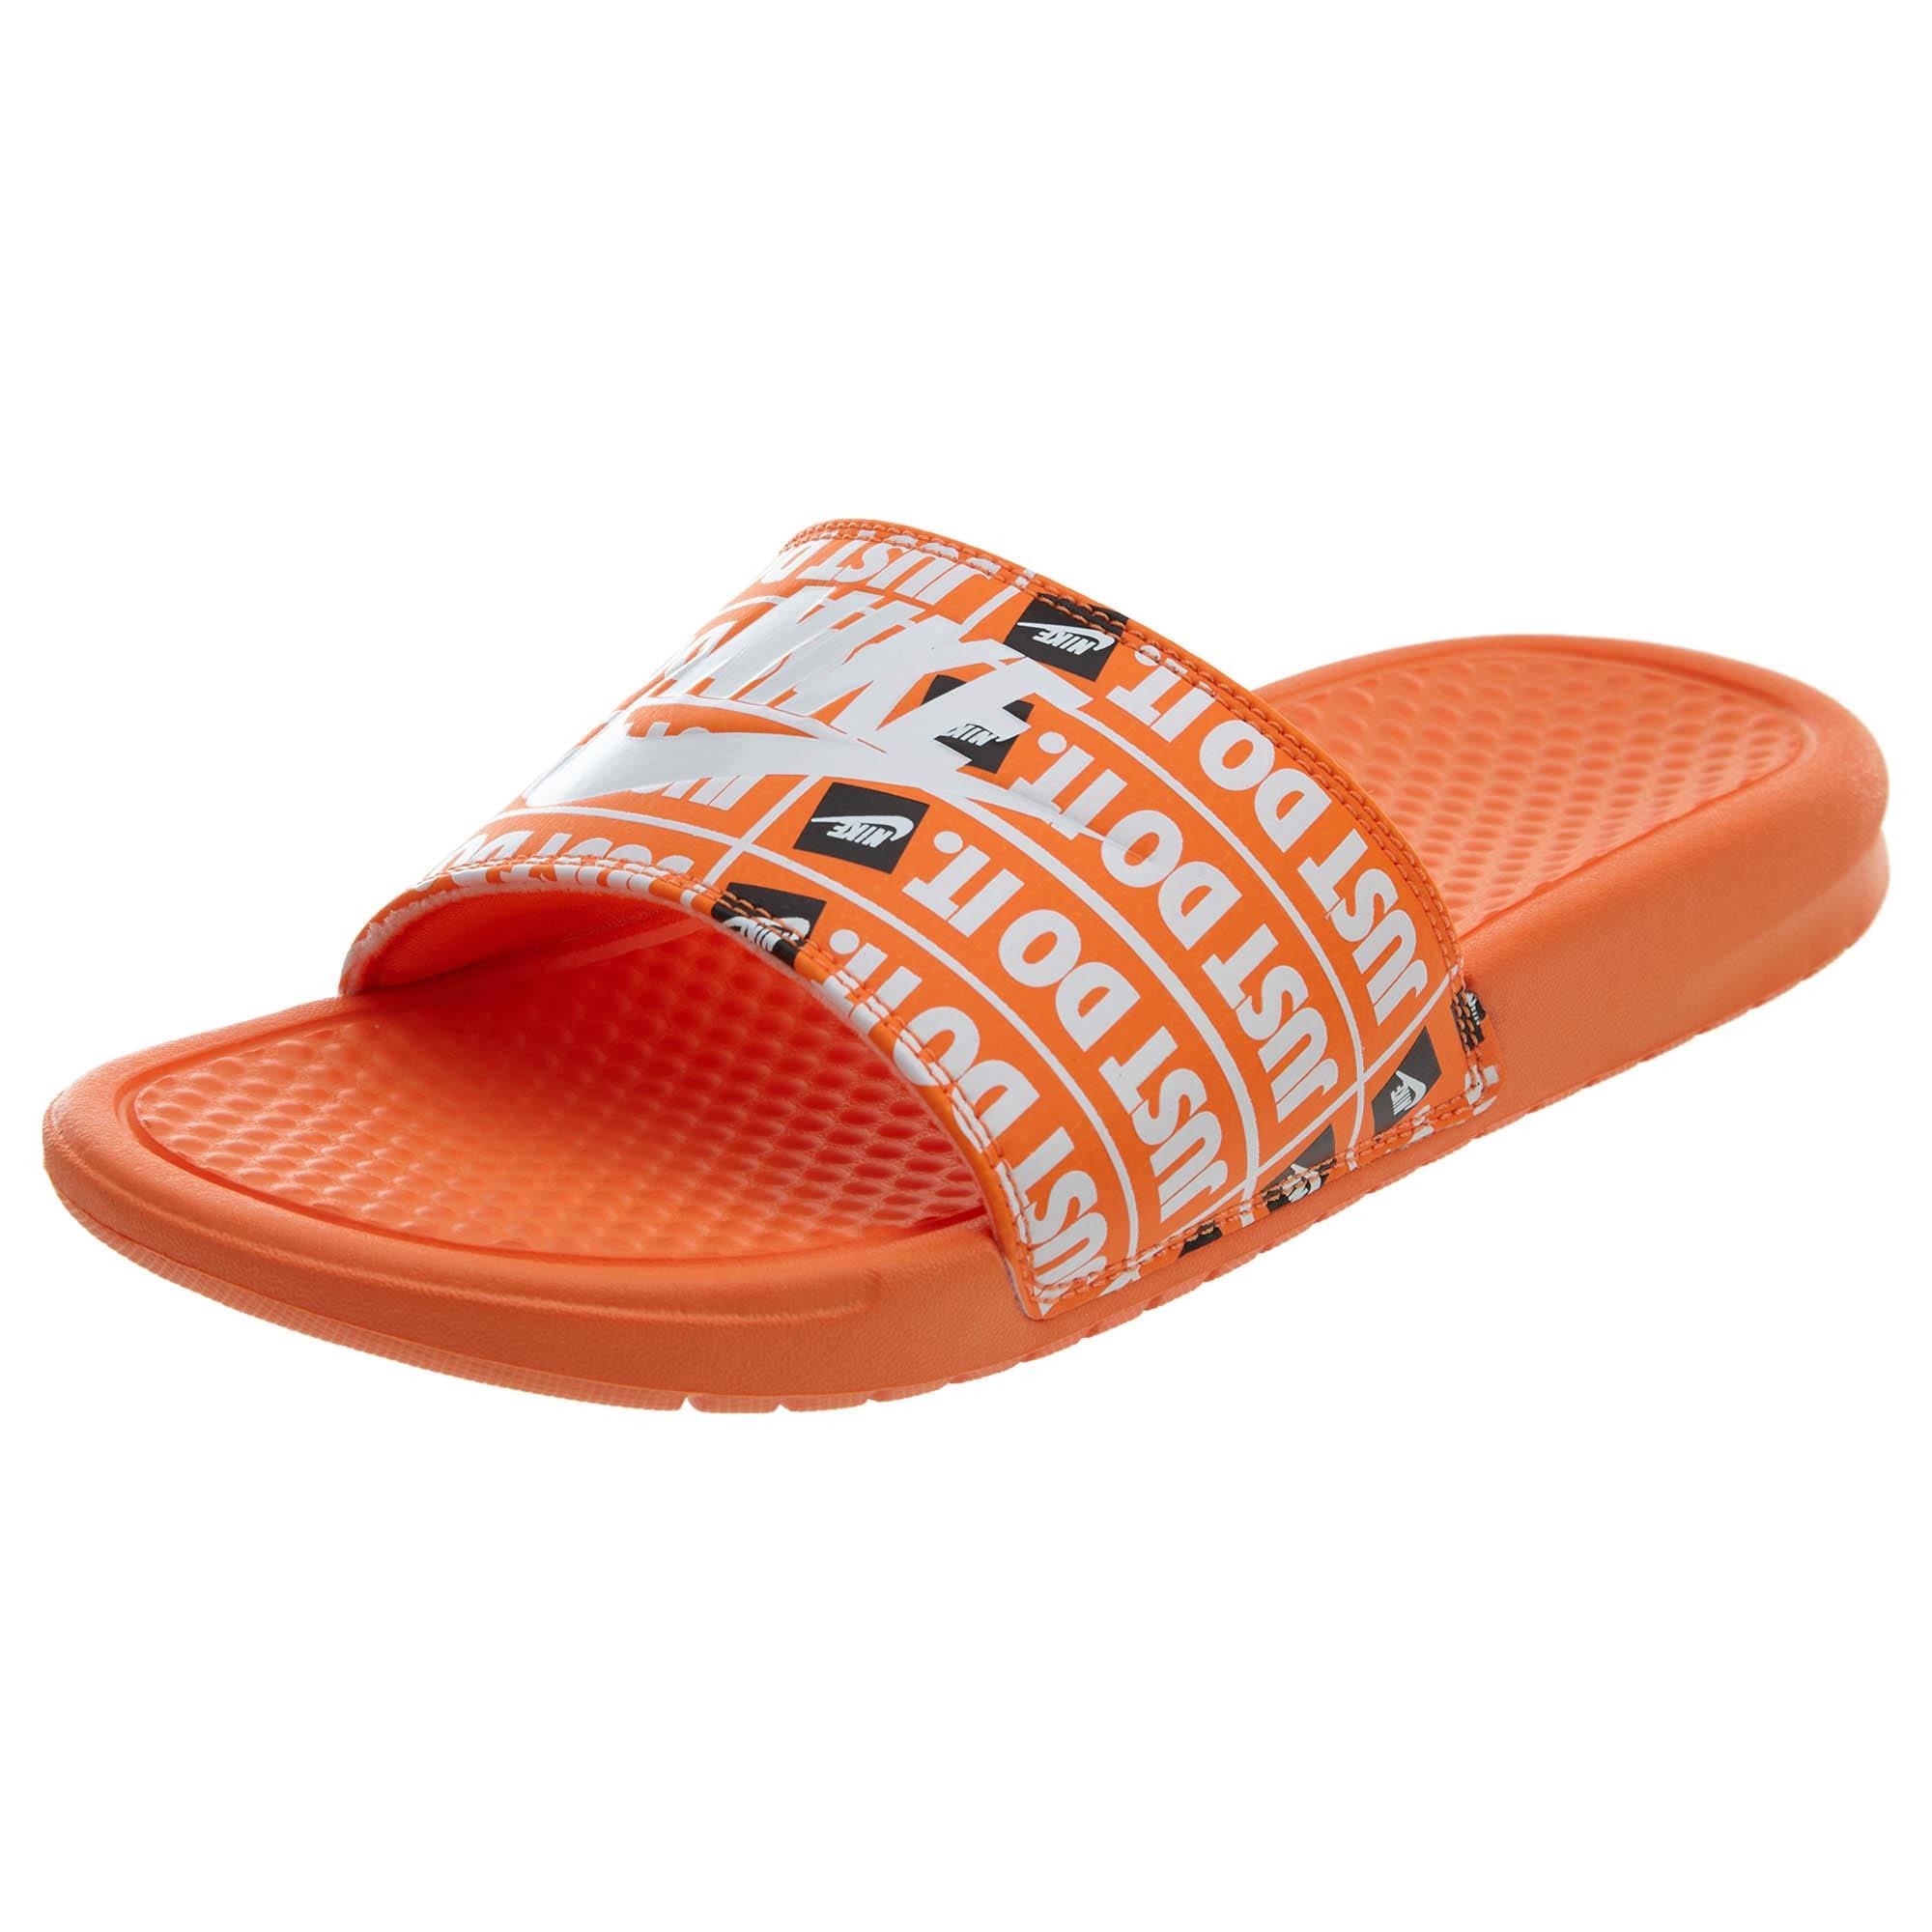 the latest 71ace 3785d Sandals Nike Benassi JDI Just Do It Print Slides Total Orange White Black  631261-800 Men s Shoes